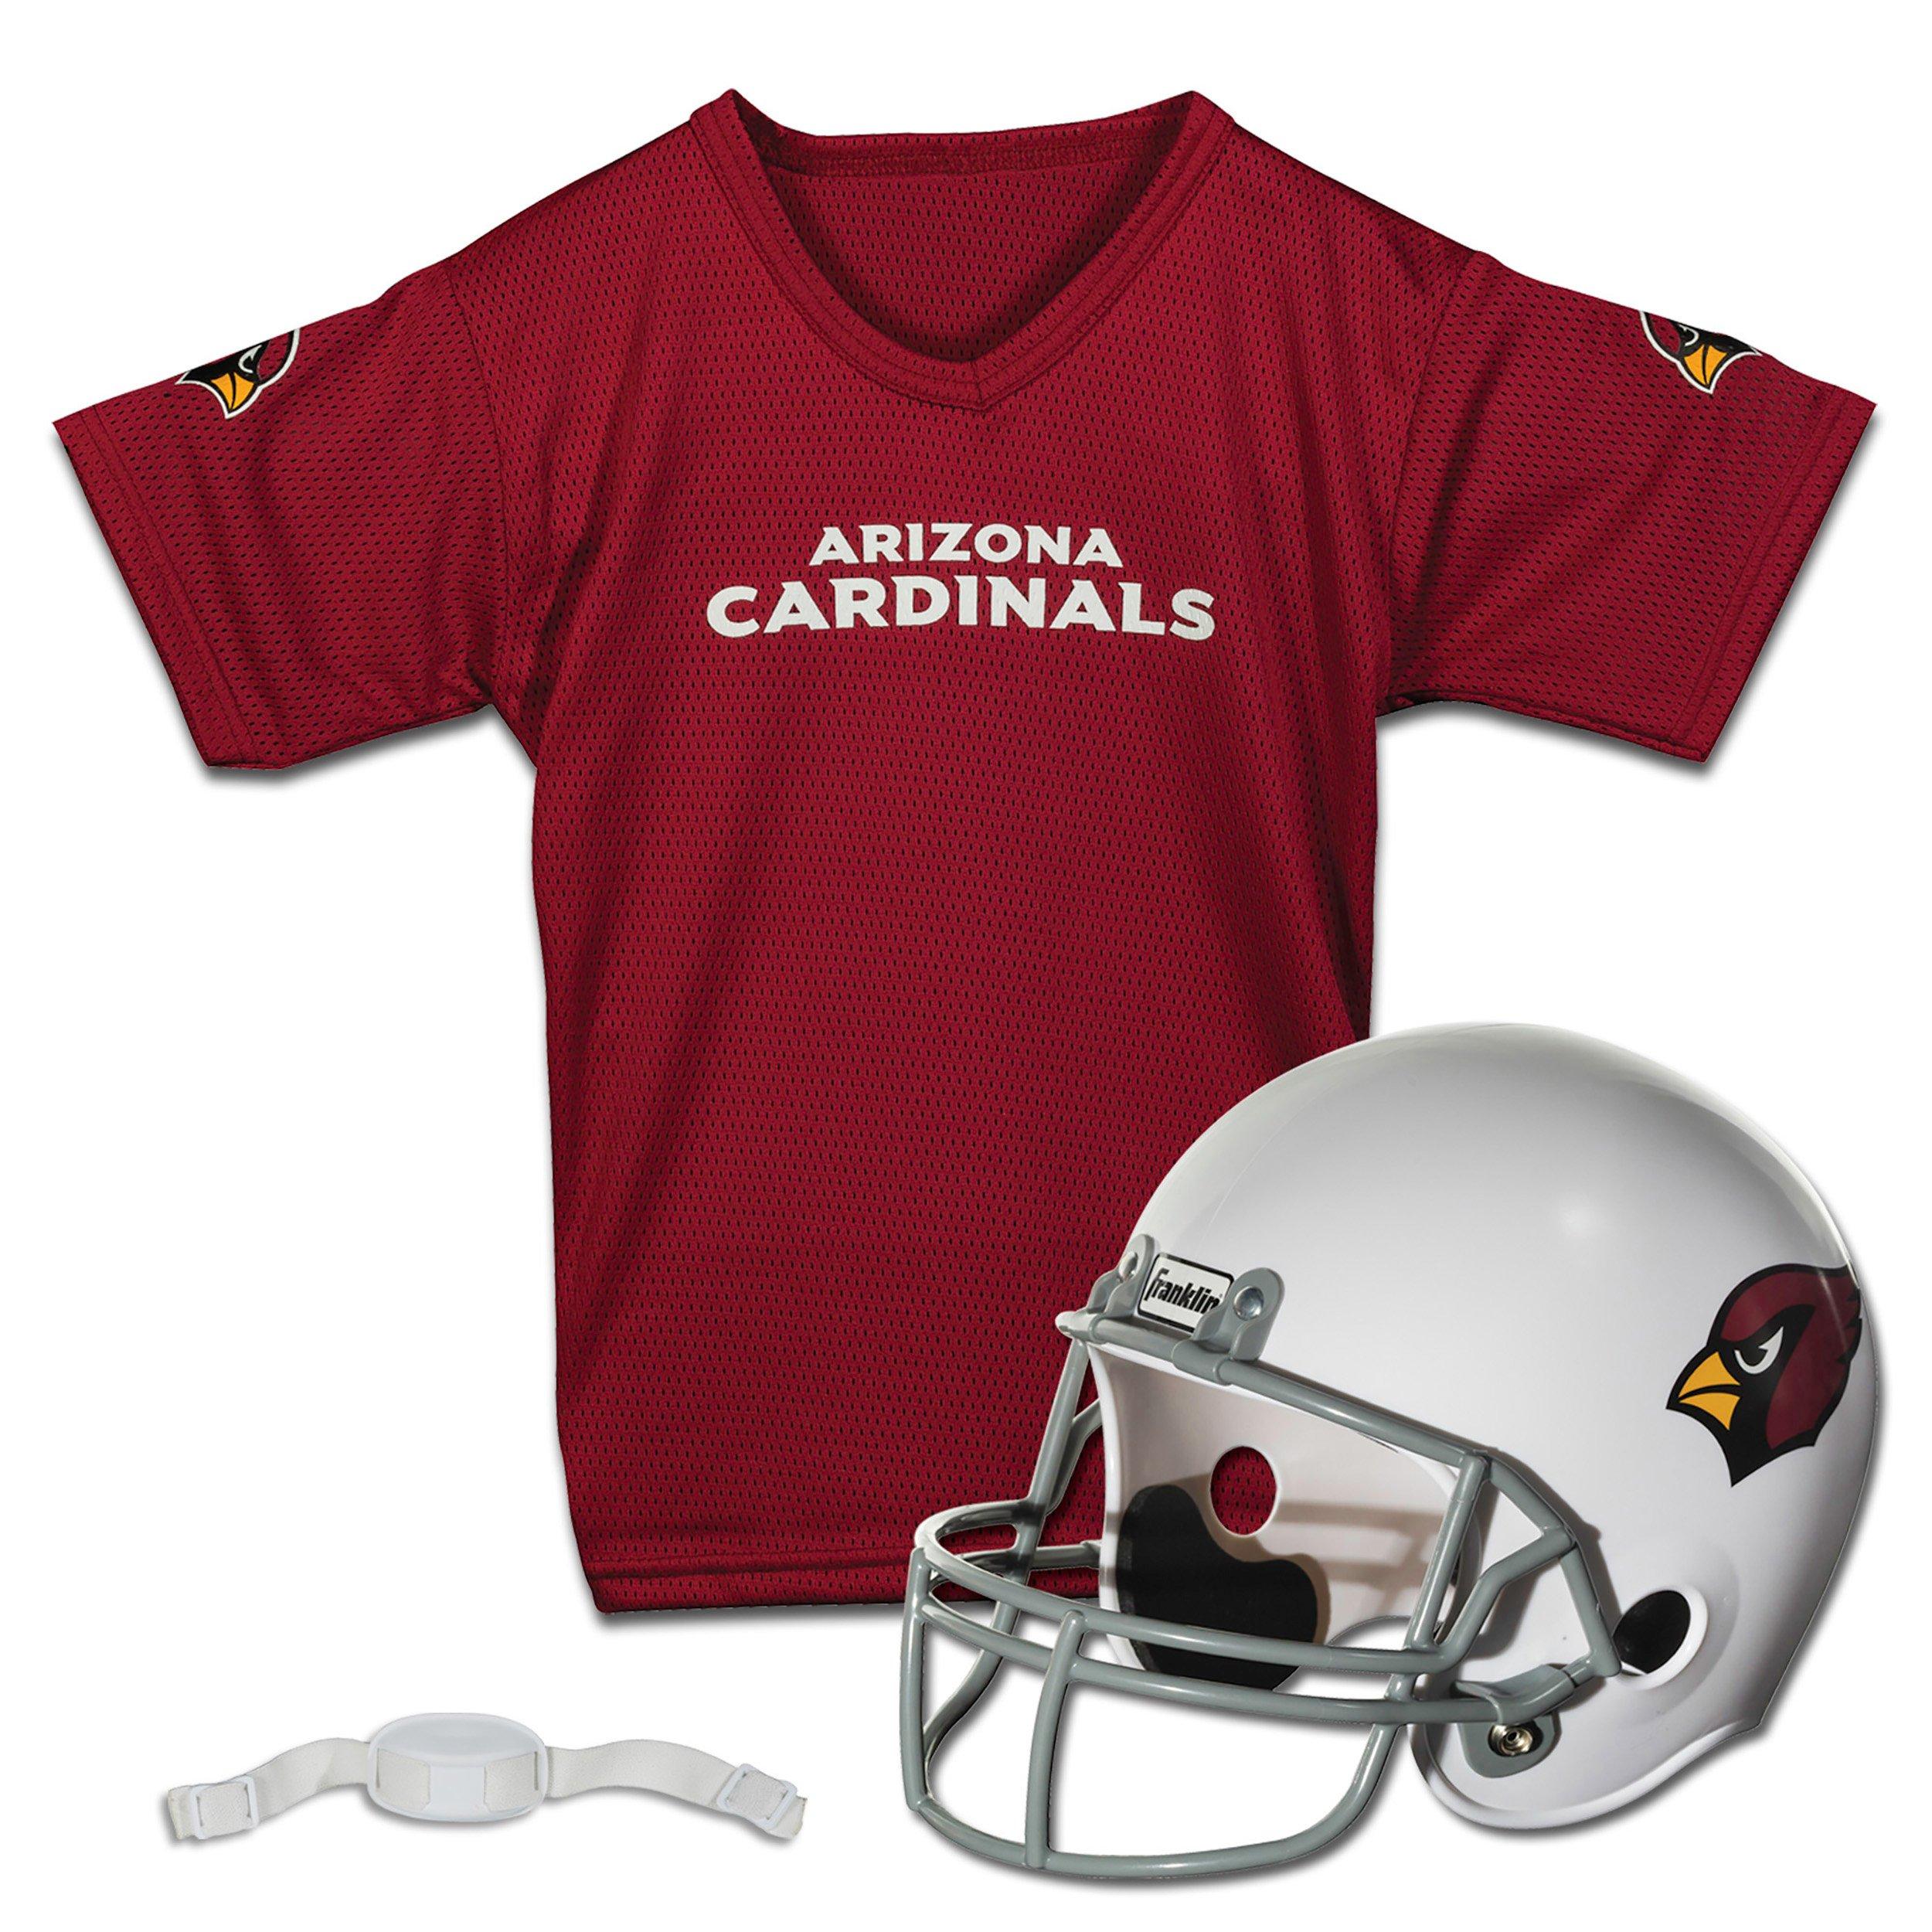 Franklin Sports NFL Arizona Cardinals Replica Youth Helmet and Jersey Set by Franklin Sports